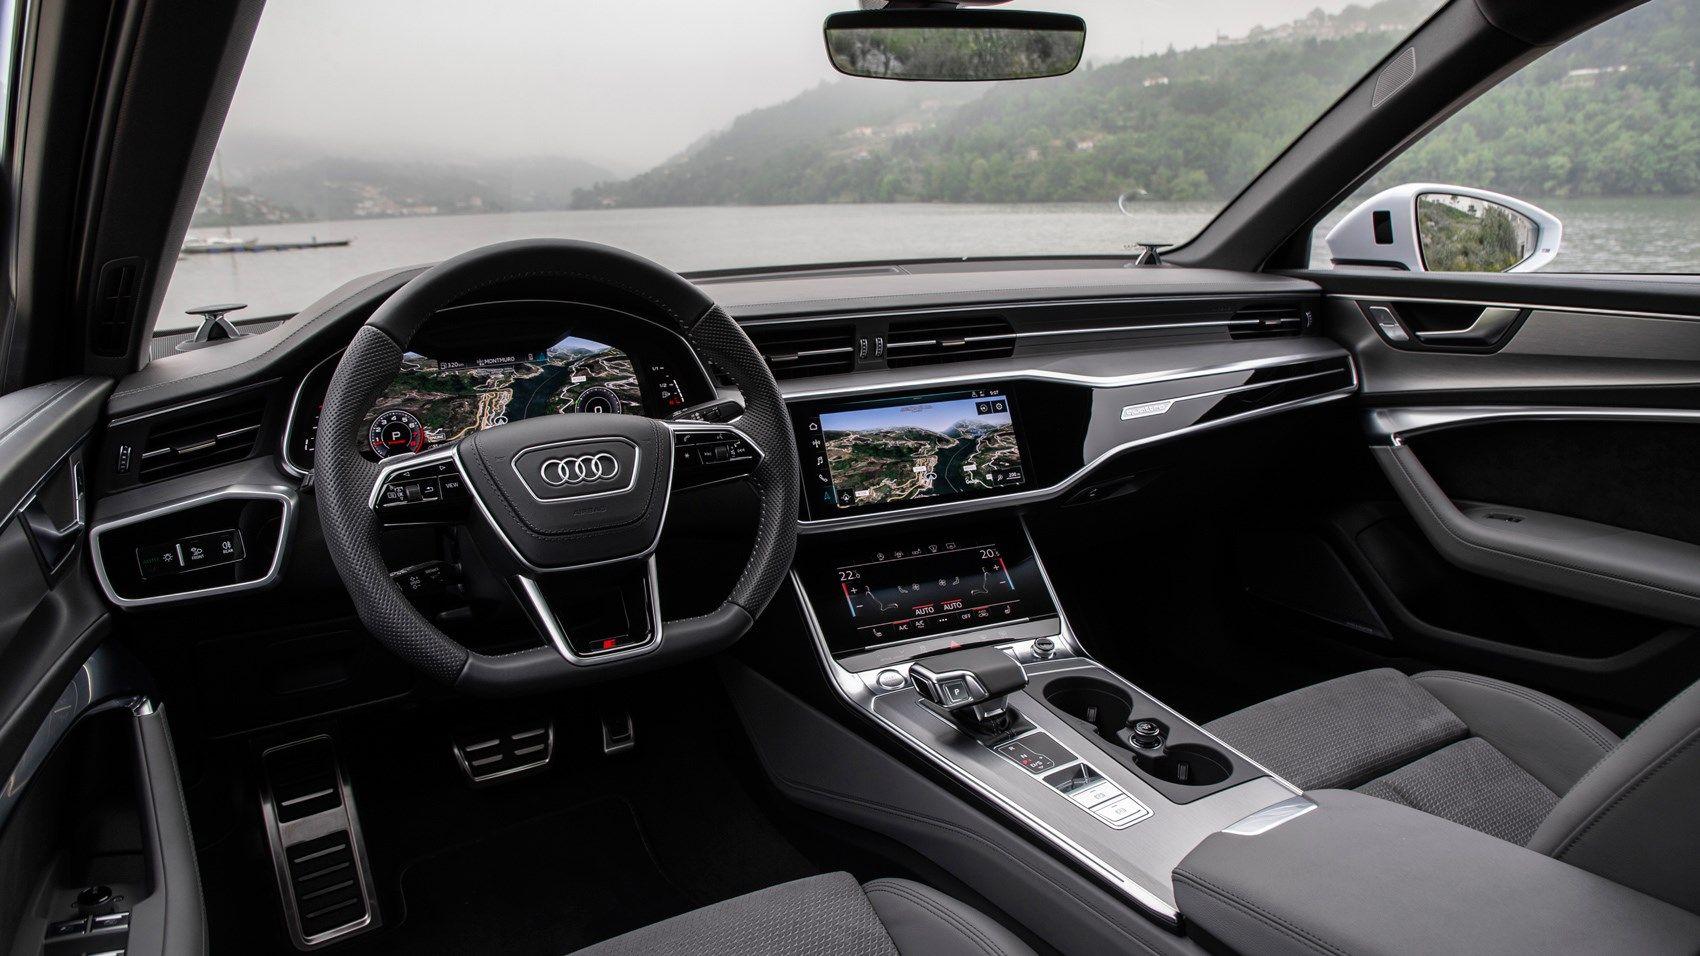 Pin By Jay L On Dream Cars In 2020 Audi Audi A6 Audi A6 Avant